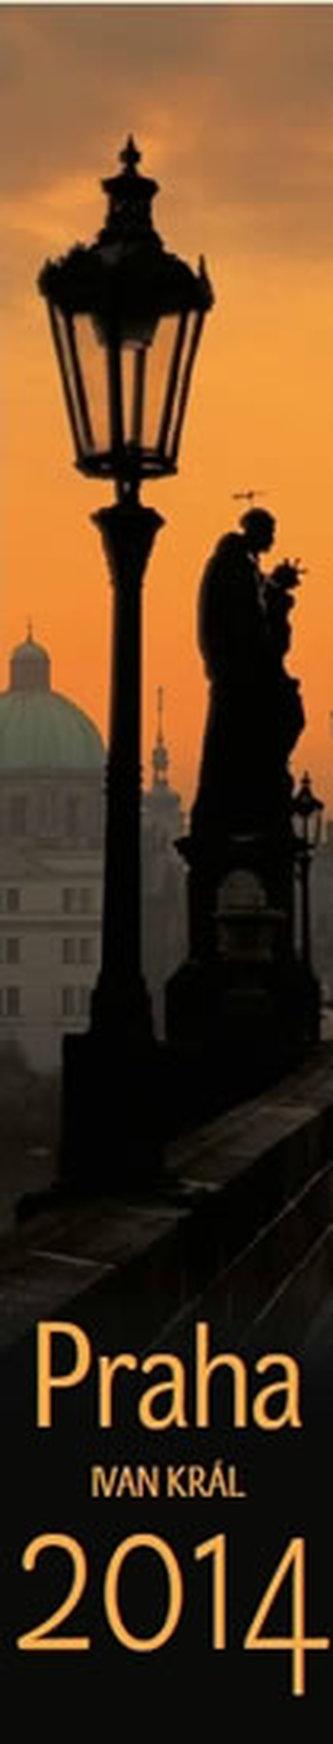 Kalendář 2014 - Praha vázanka